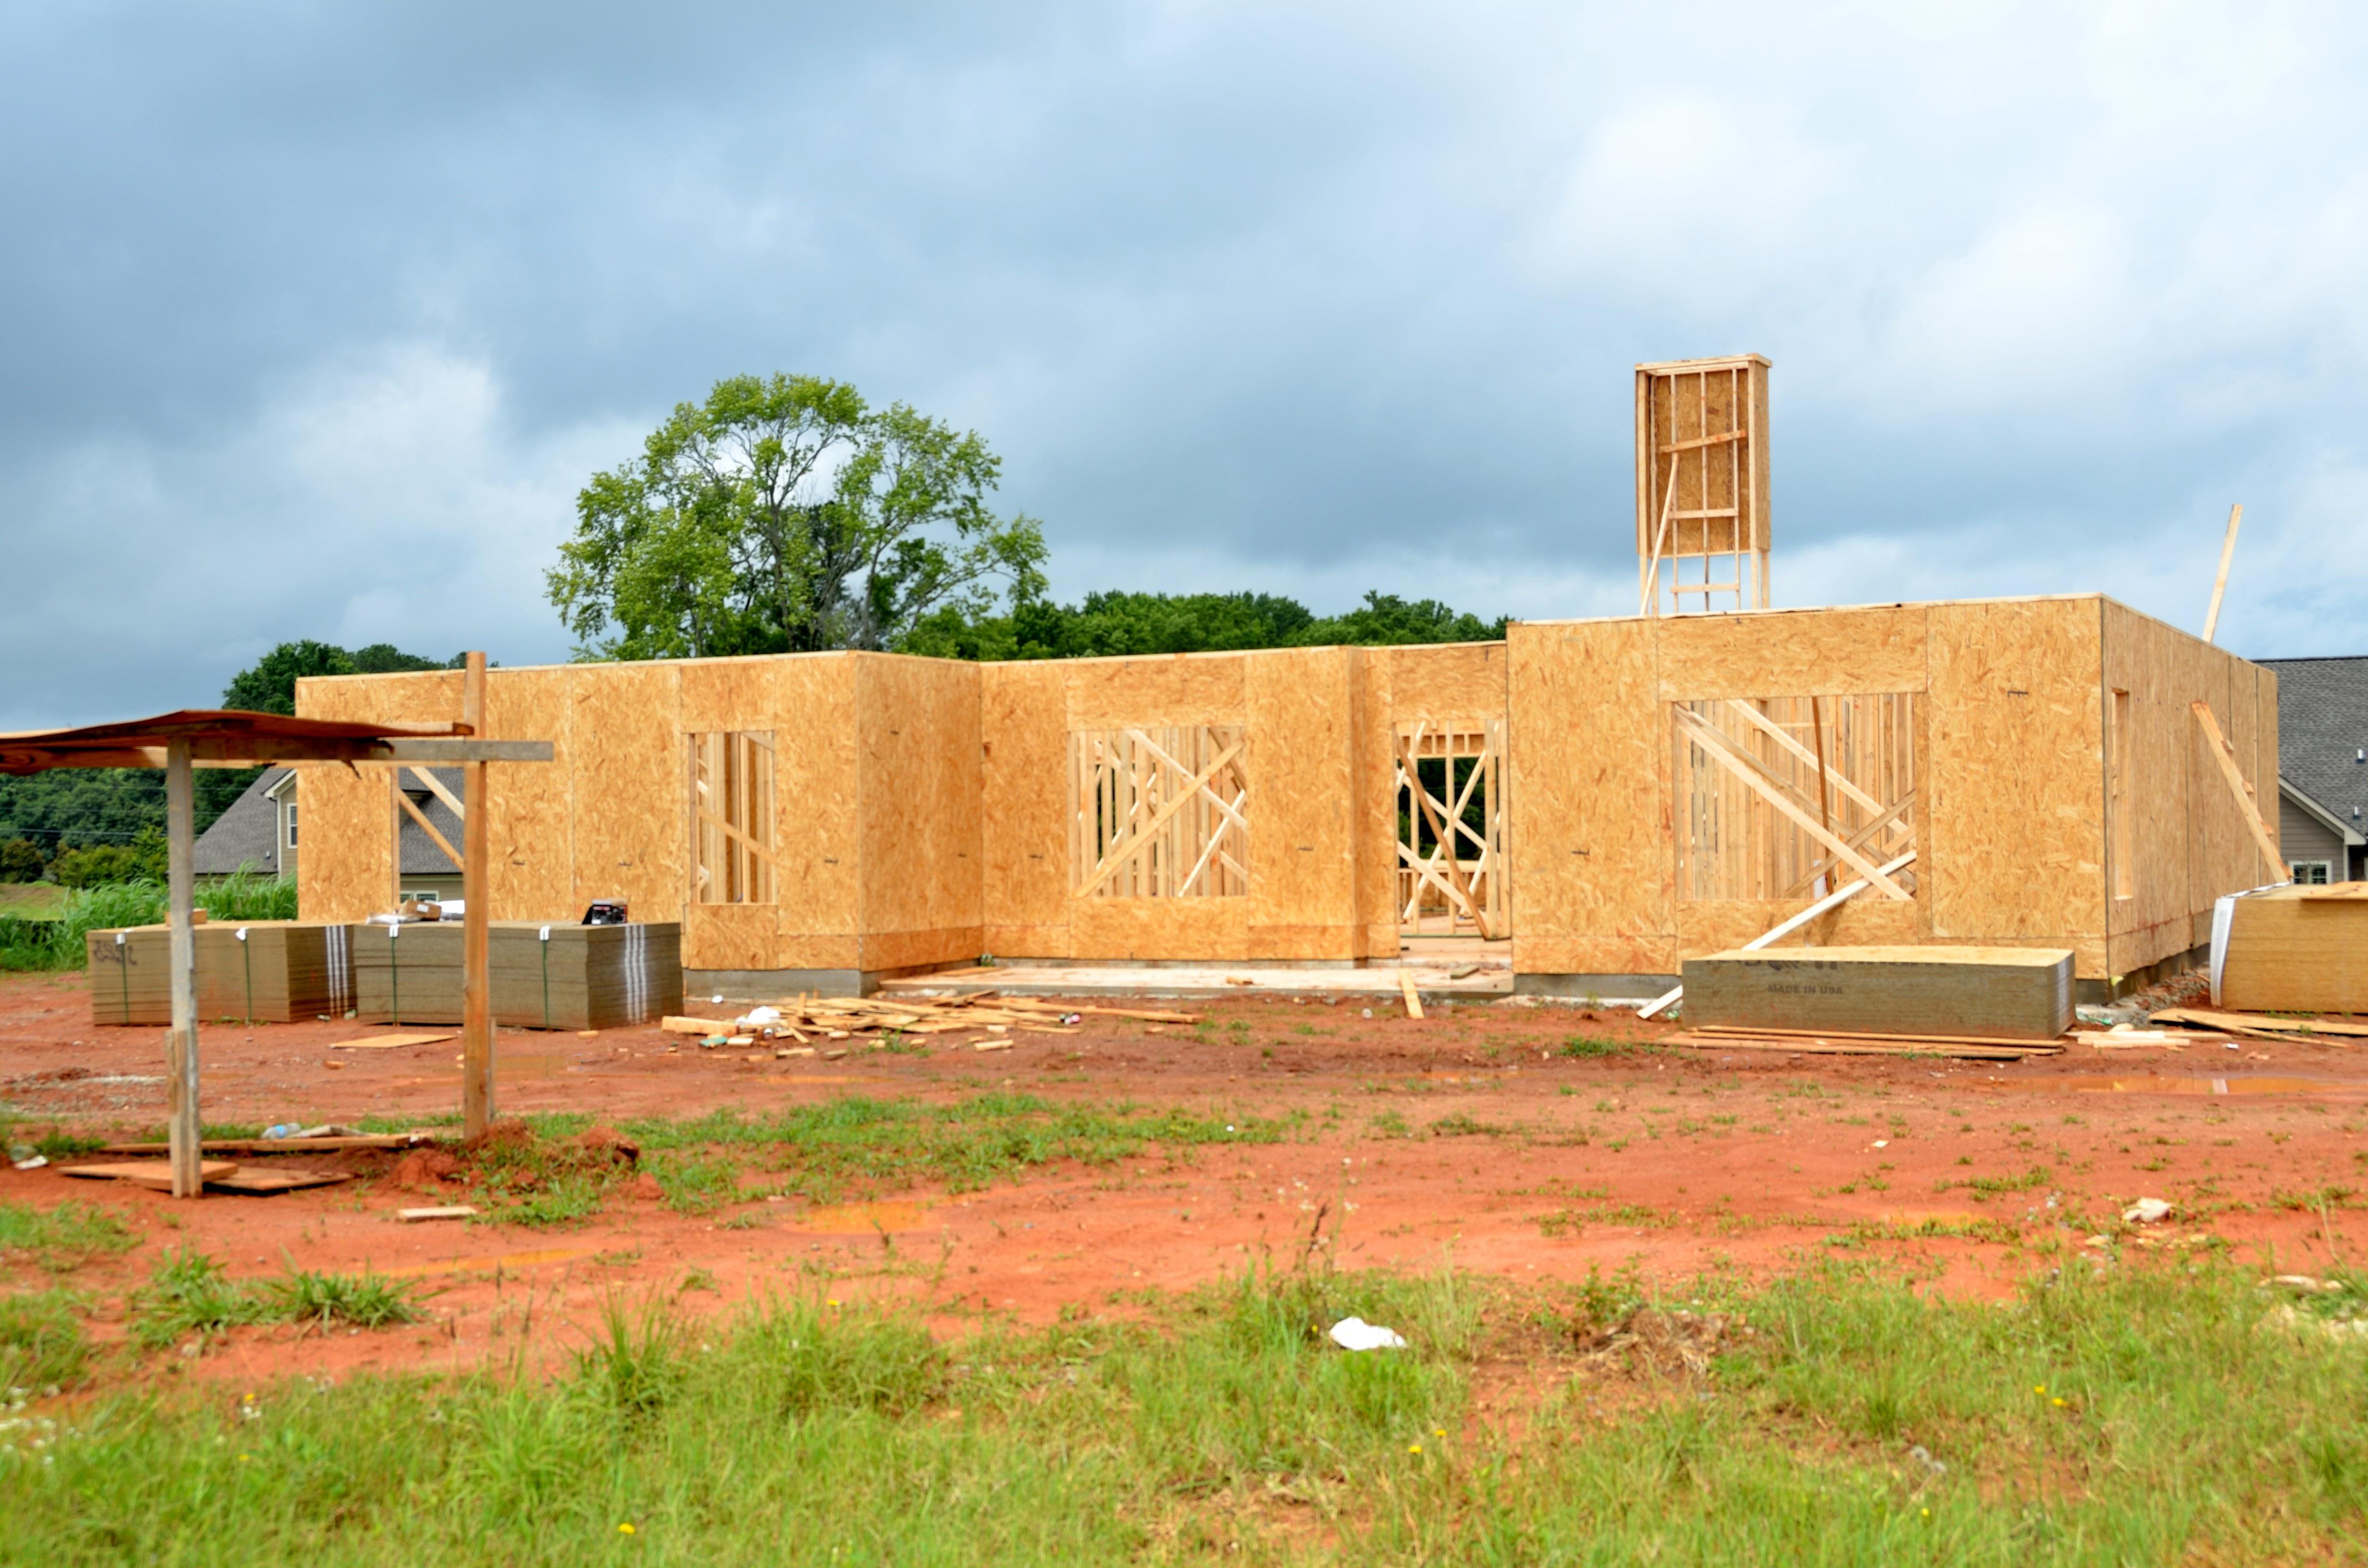 Fotos gratis : arquitectura, estructura, cielo, madera, granja, casa ...